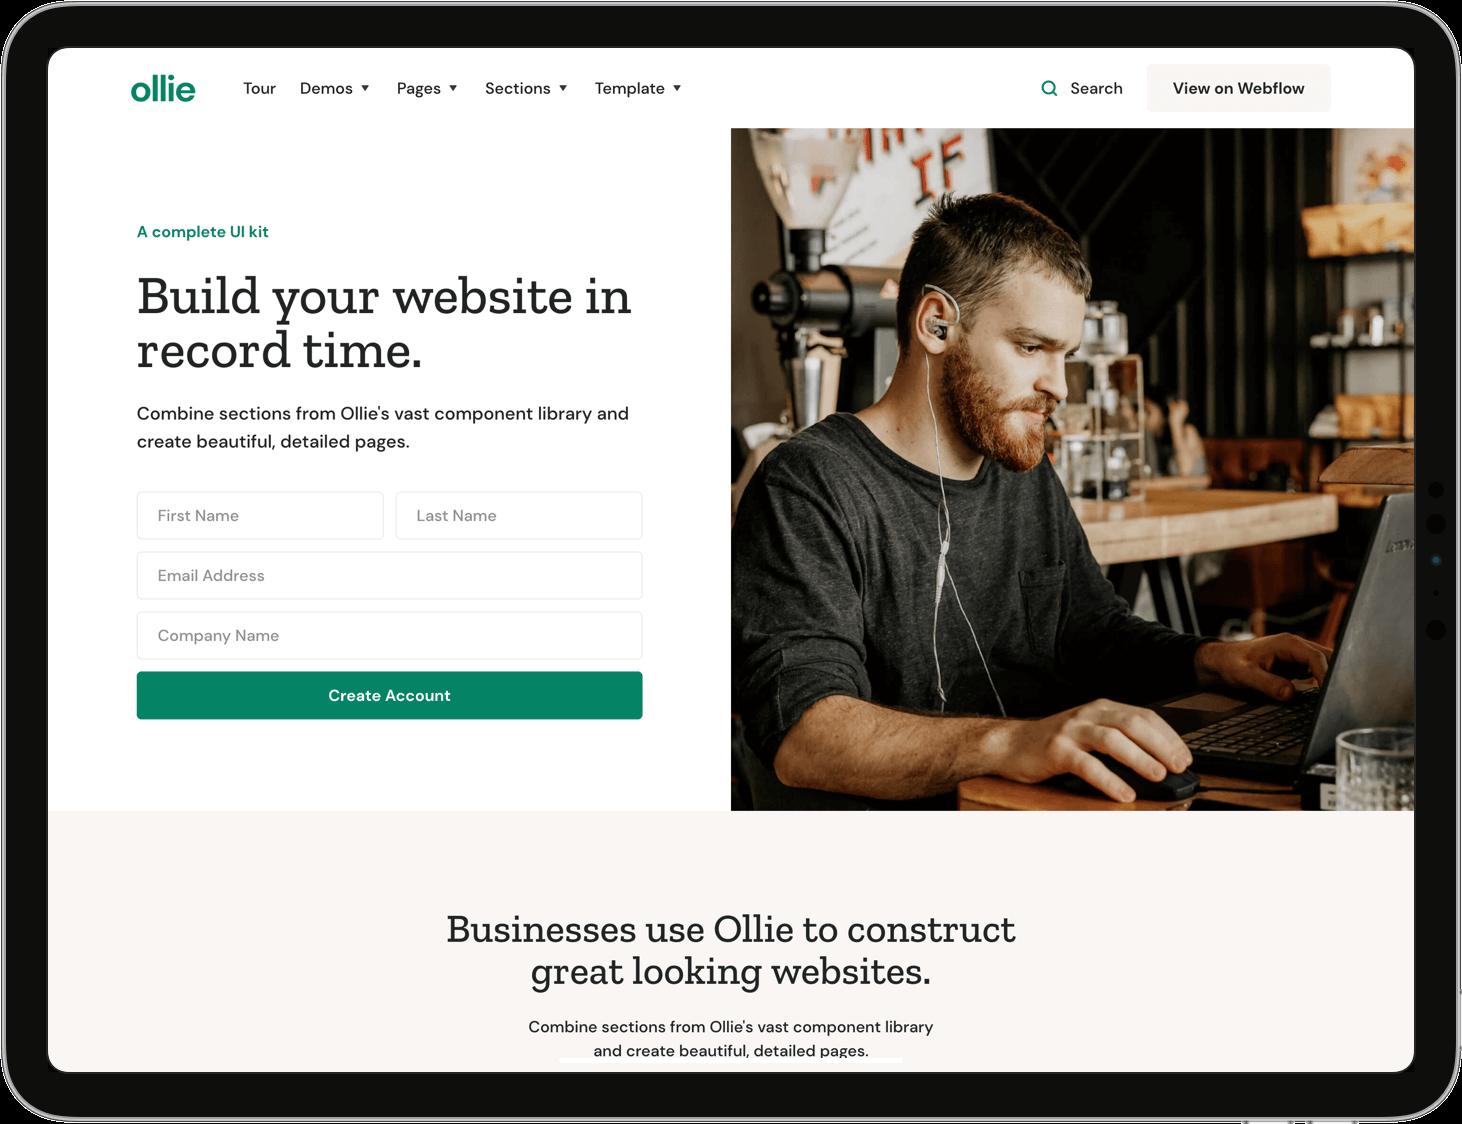 Screenshot of Ollie's website.